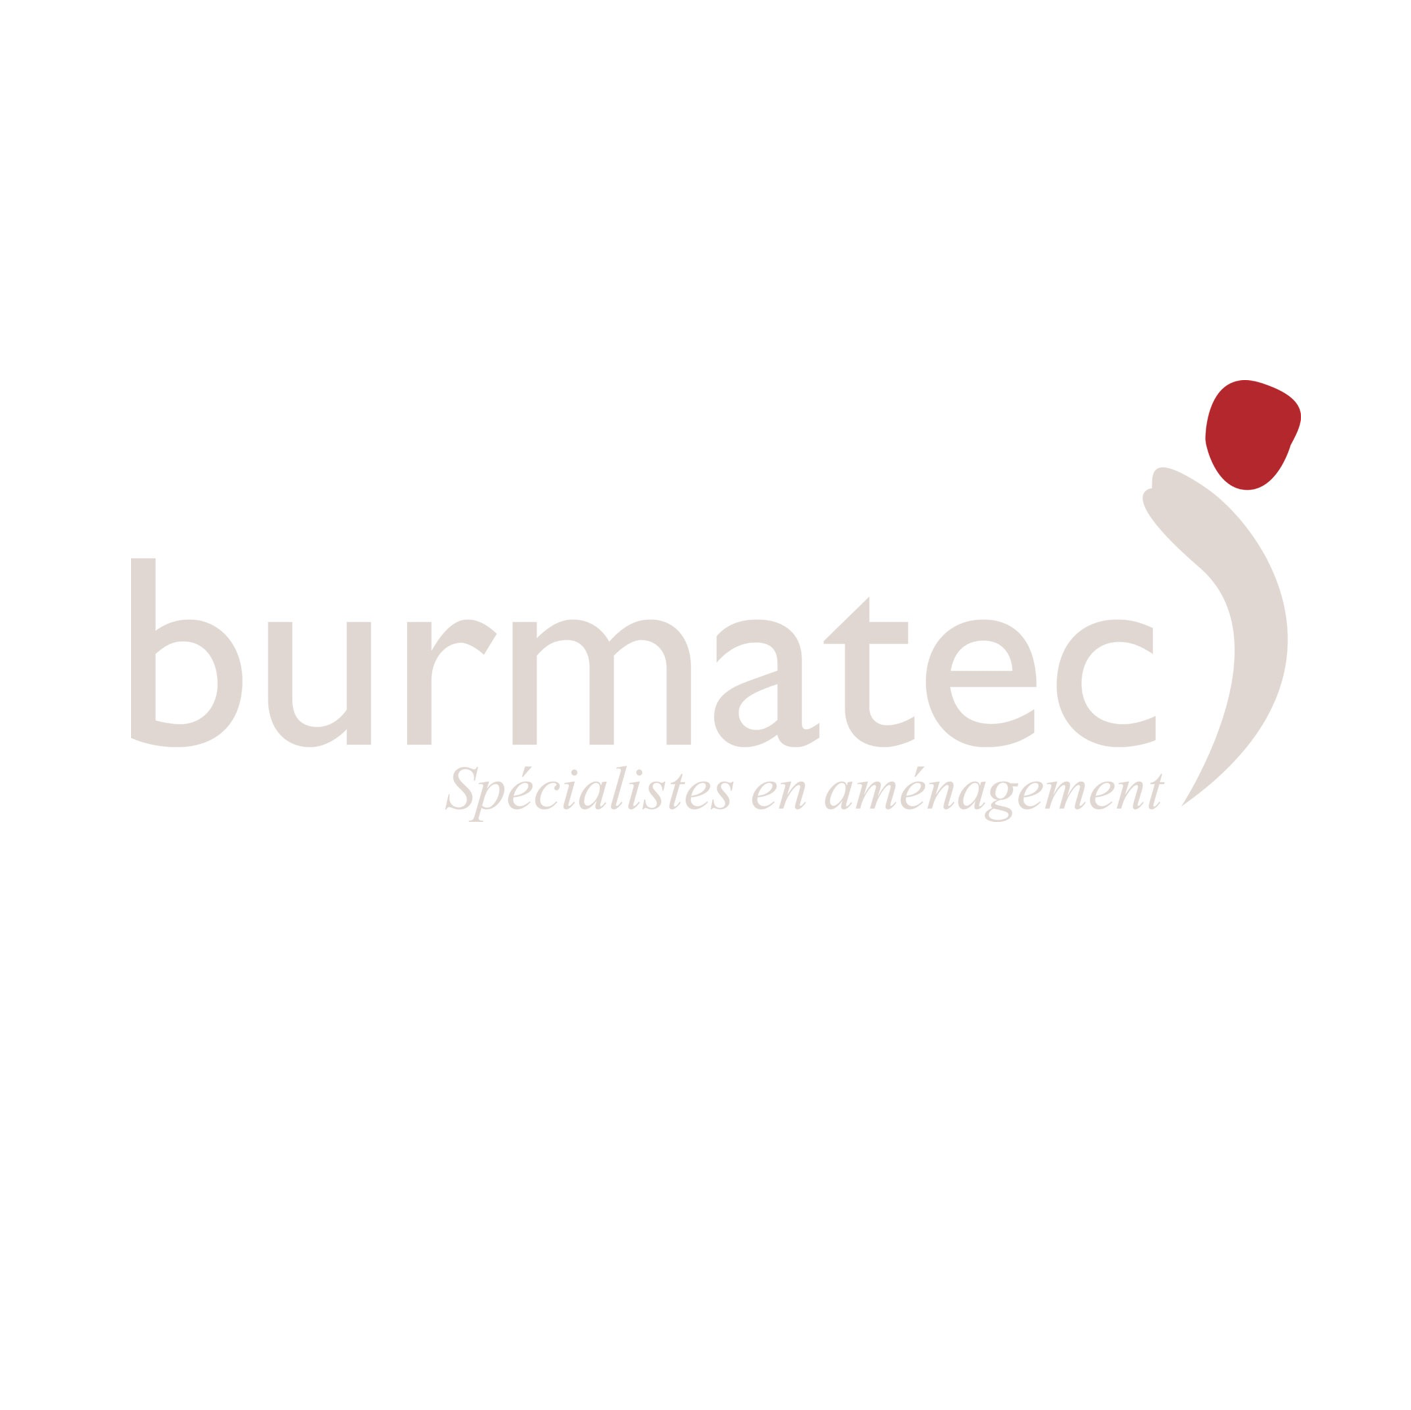 Burmatec